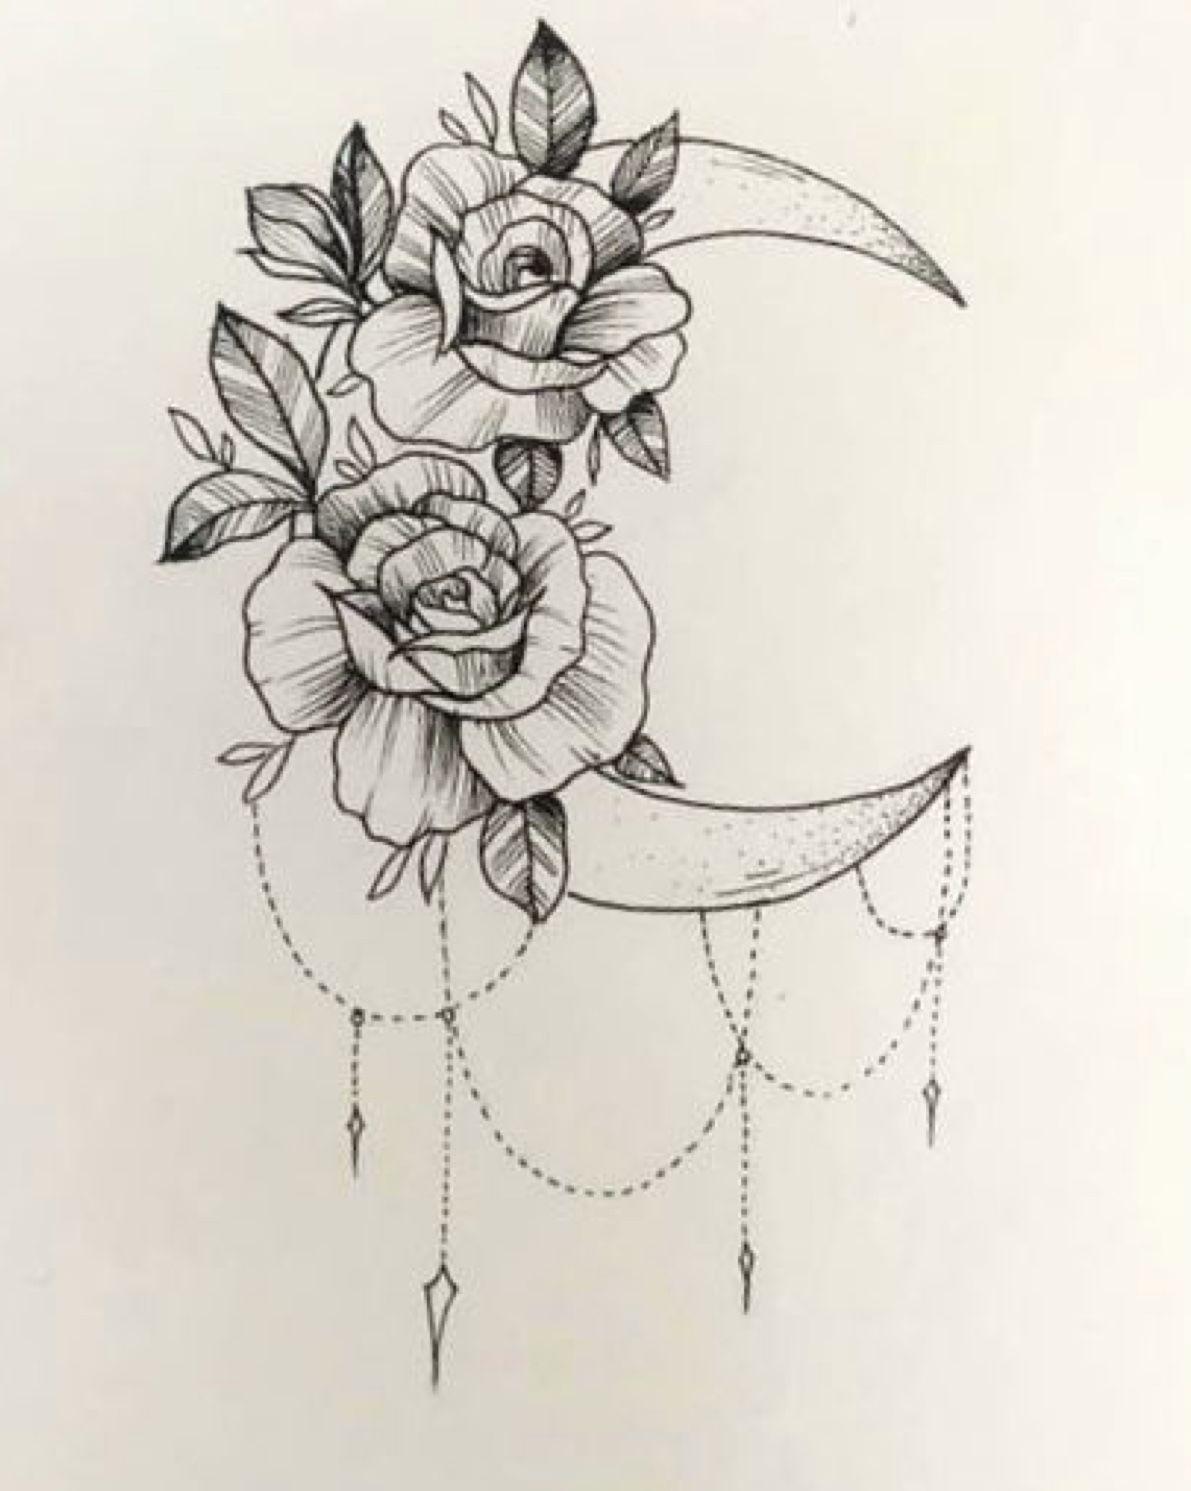 Pin By Shelby Heyn On Tattoos Tattoo Design Drawings Body Art